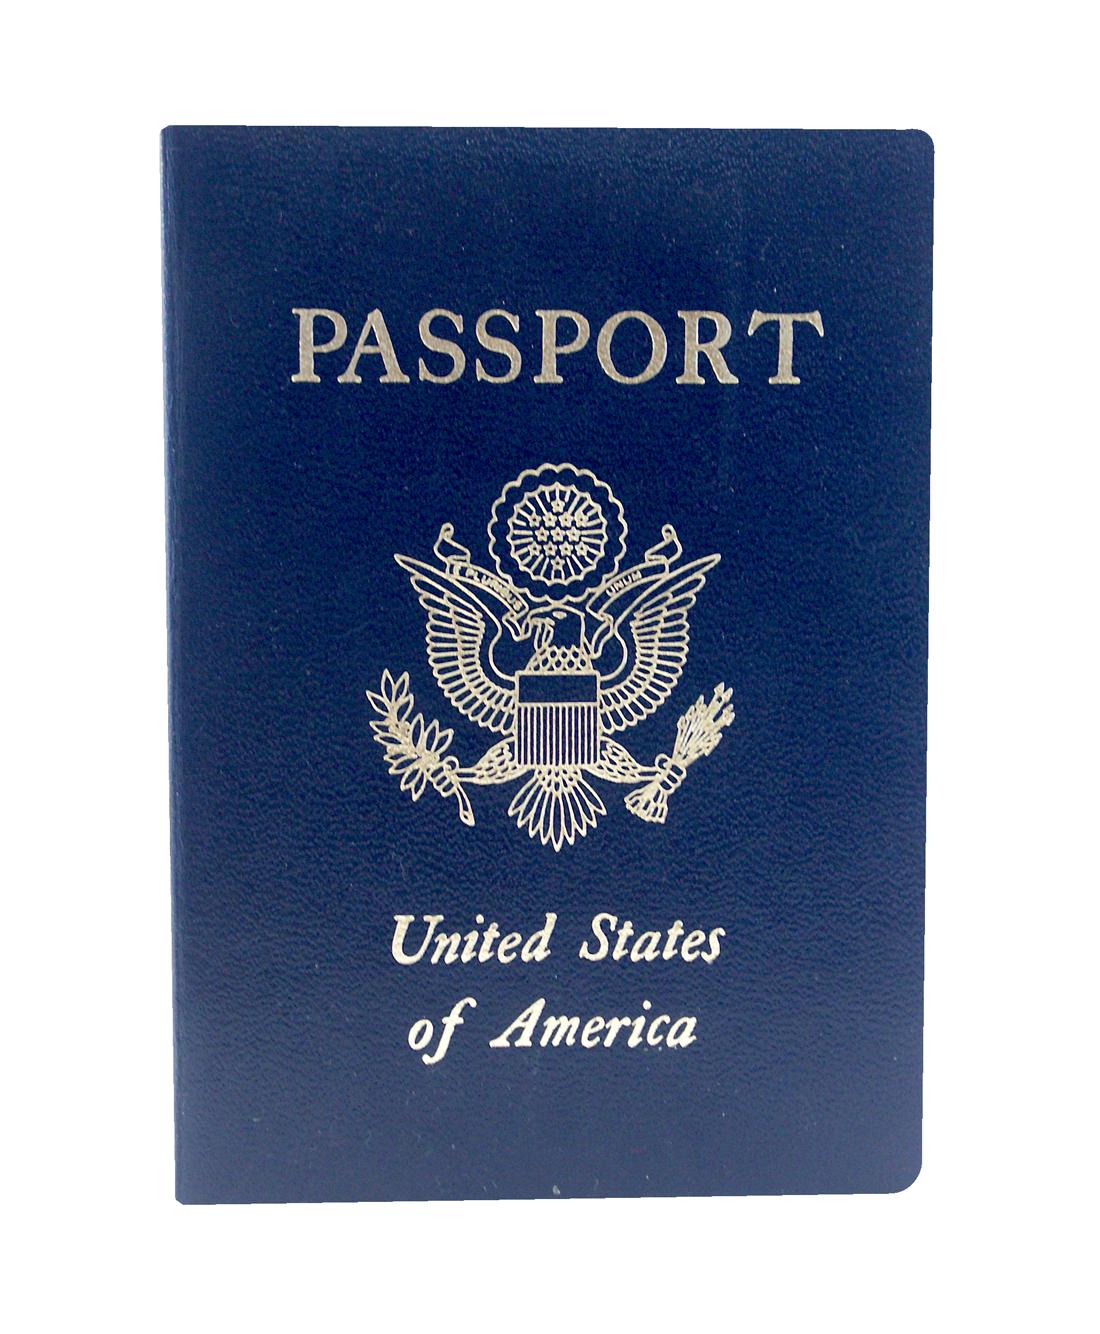 Passport HD PNG - 92010